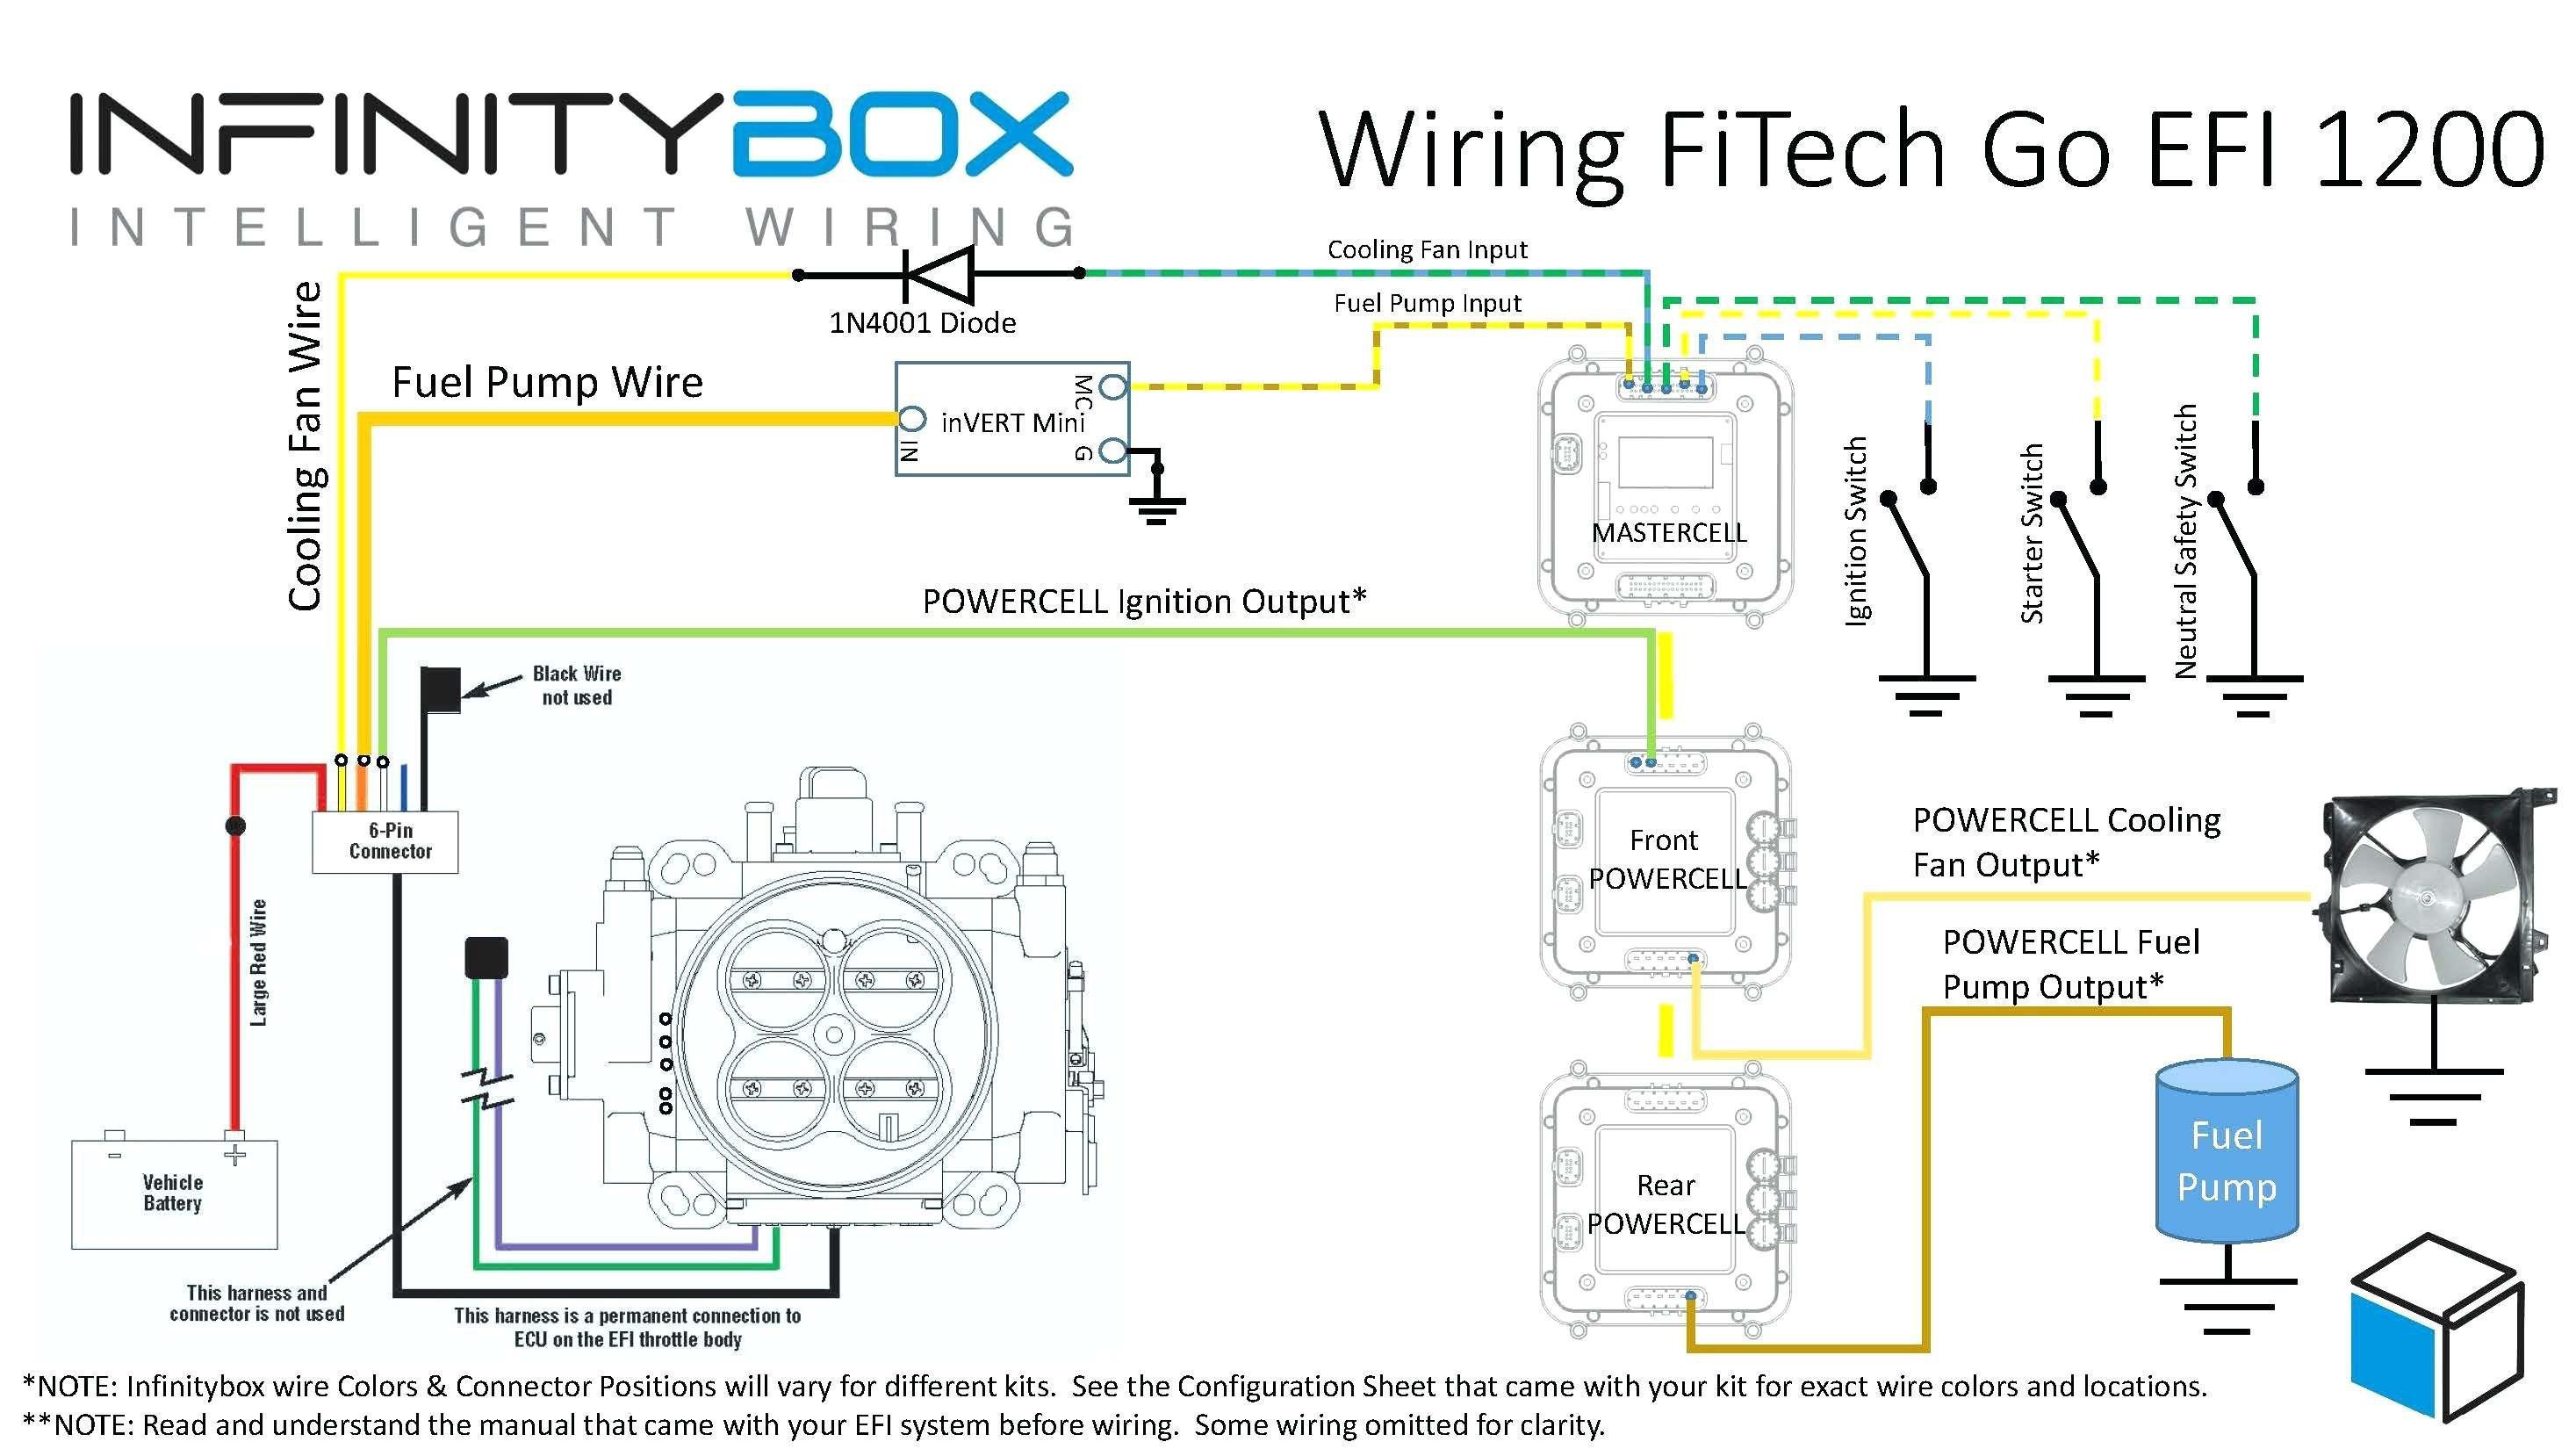 50 Amp 3 Prong Twist Lock Plug Wiring Diagram from annawiringdiagram.com